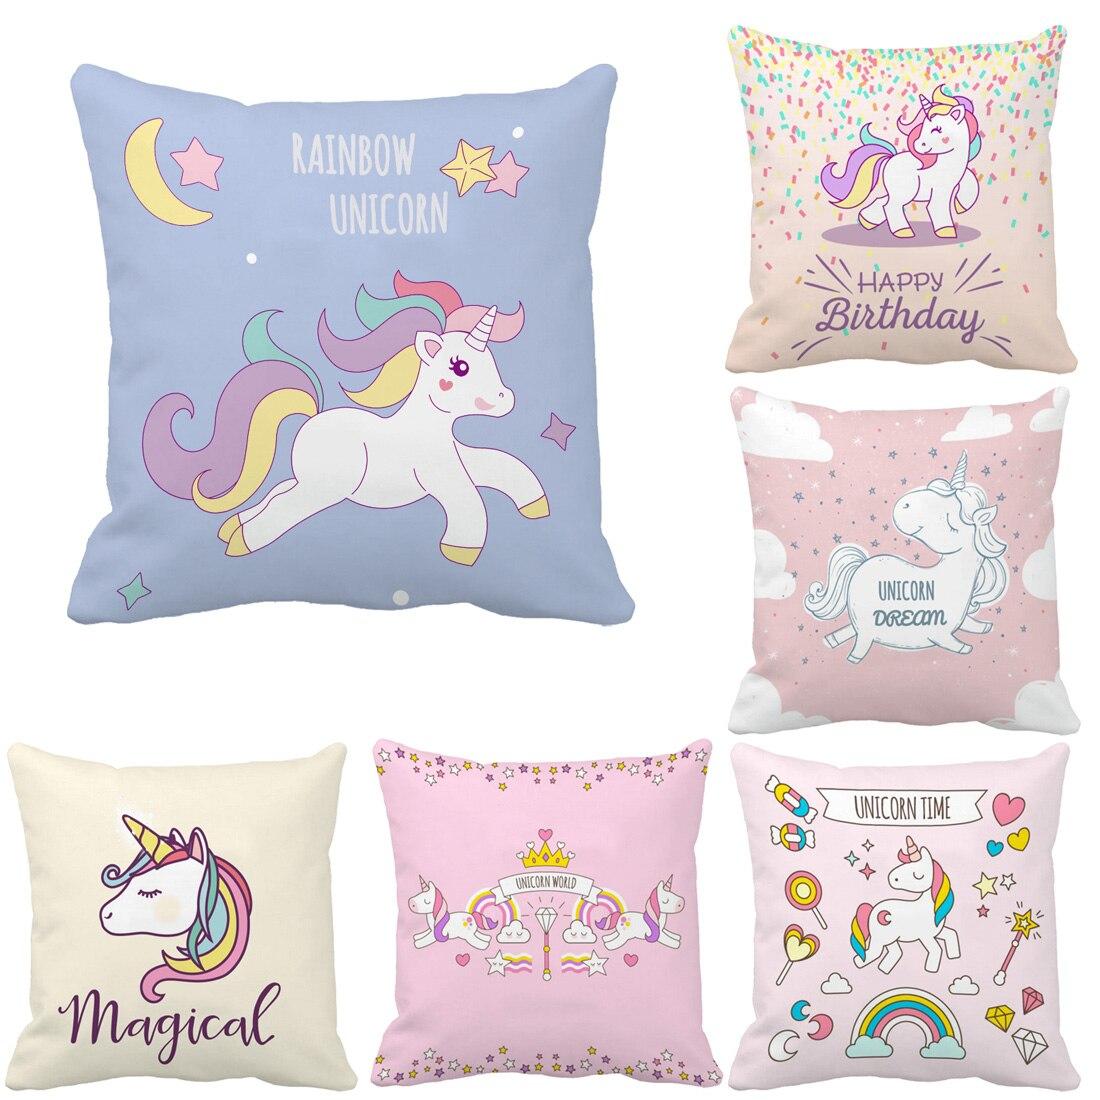 Cartoon Unicorn Print Custom Cute <font><b>Cushion</b></font> For Sofa Car Vintage Throw Pillow <font><b>Home</b></font> Decor Cojines Decorative Pillows For Gift